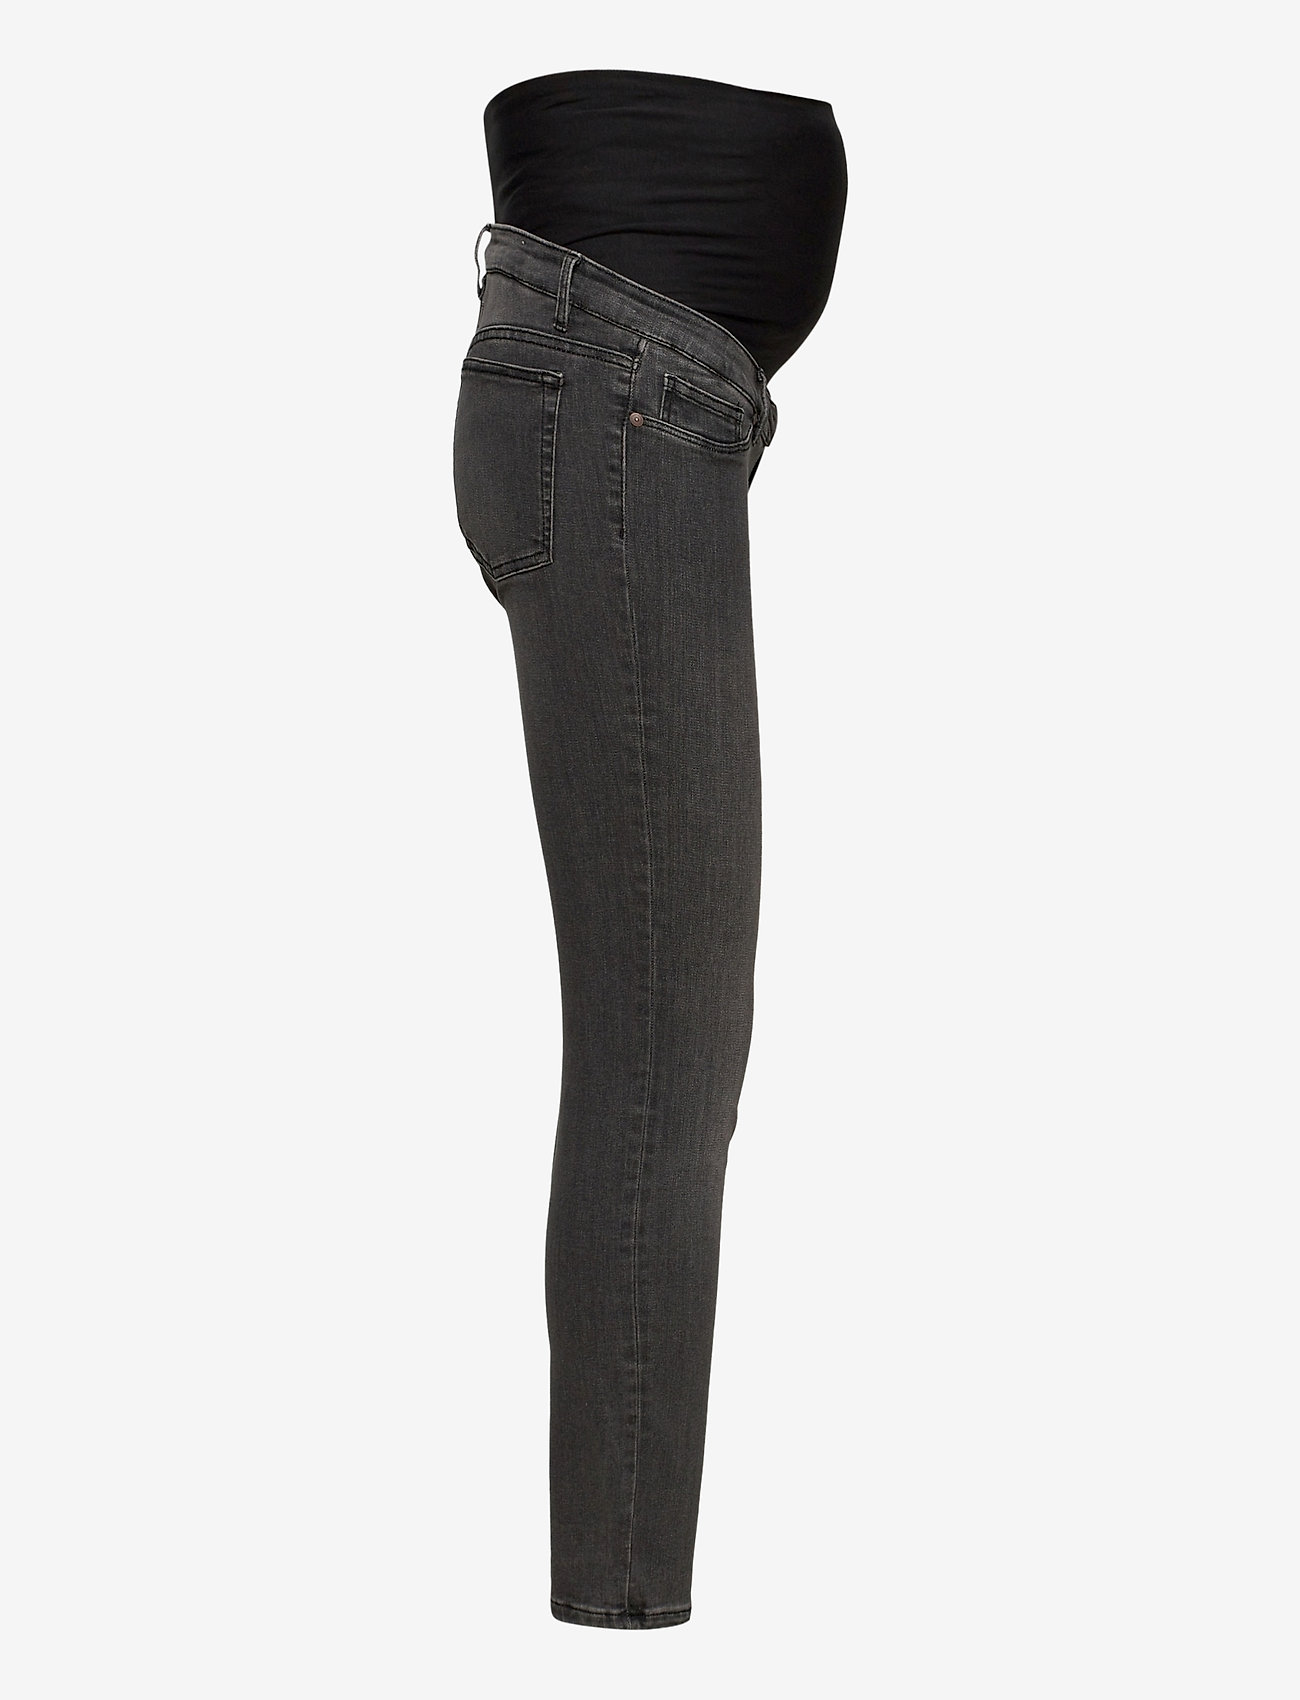 Lindex - Trousers denim  MOM Clara blac - skinny jeans - black - 3